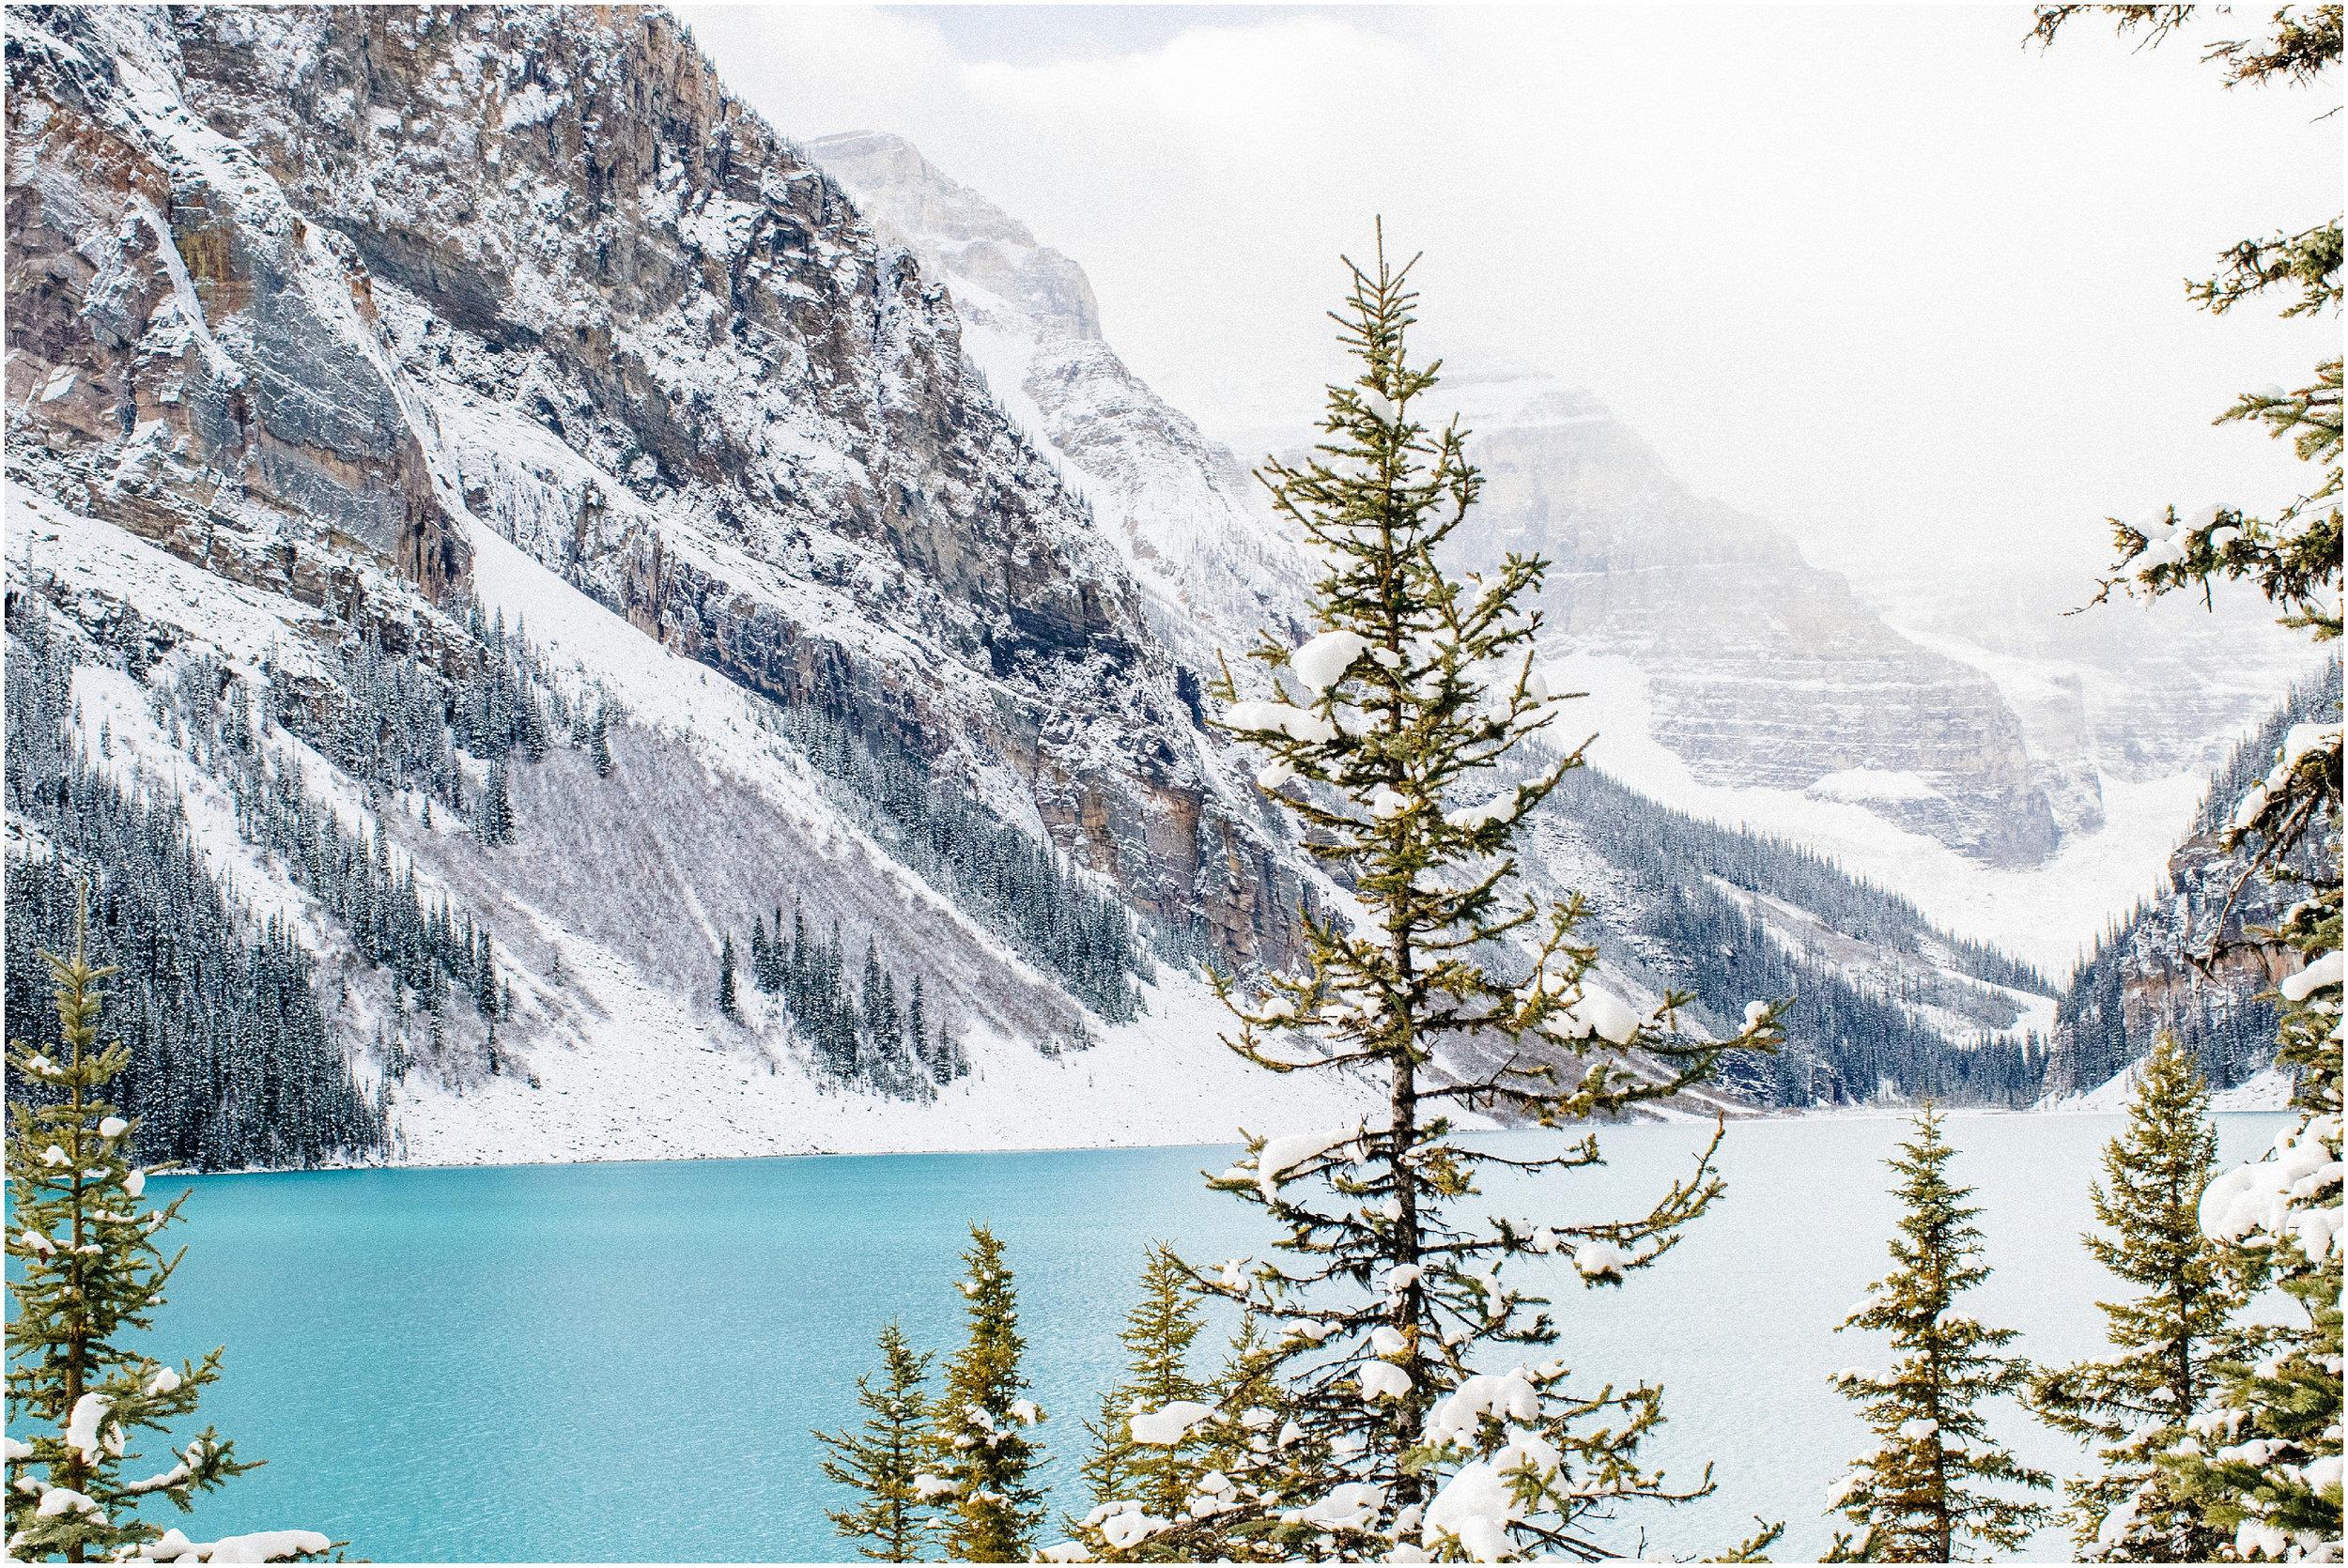 Banff_Travel_Photographer-60.jpg